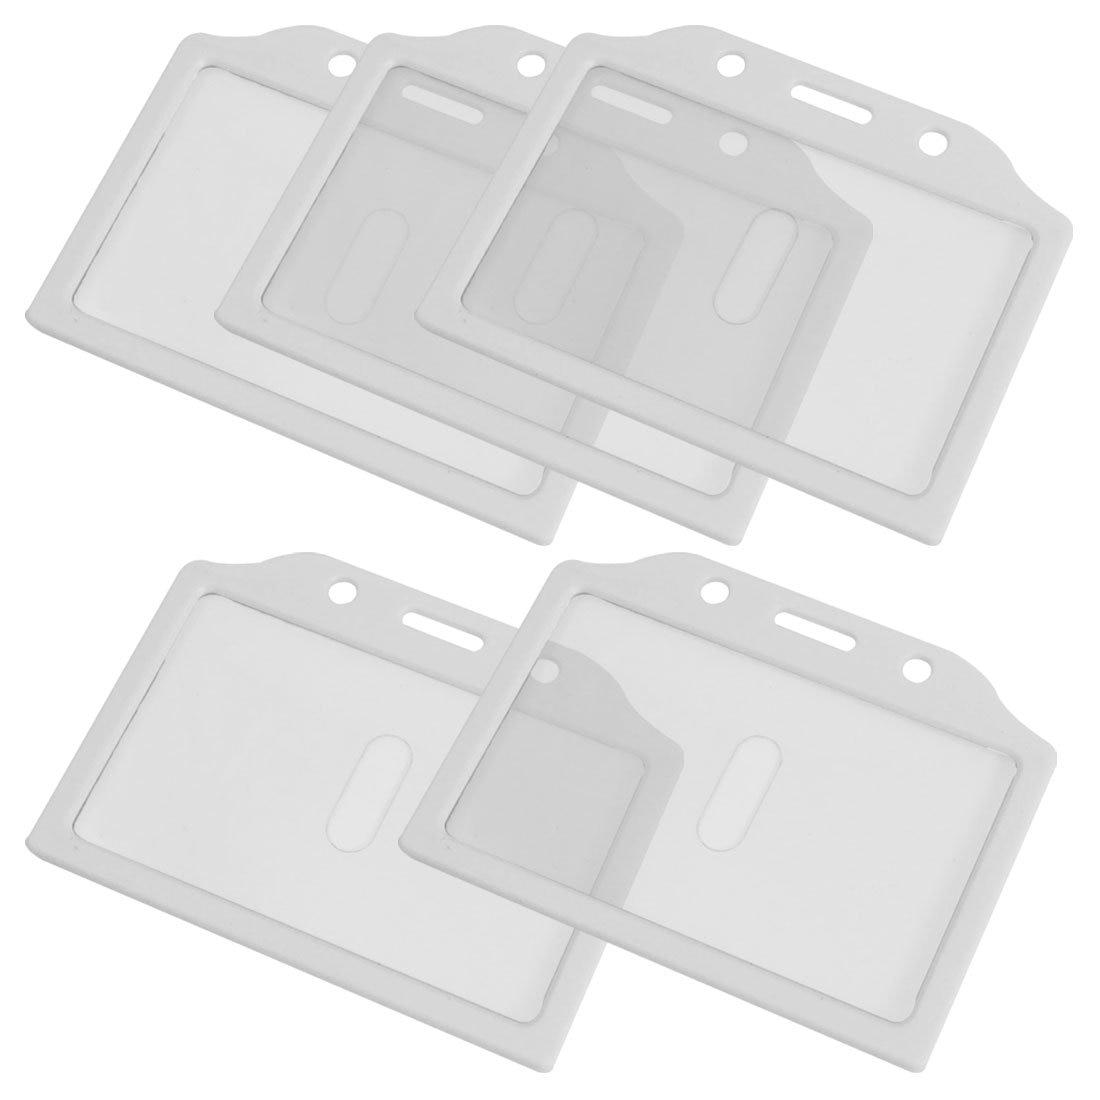 Wholesale 10pcs 5x White Clear Plastic Credit Card Holder